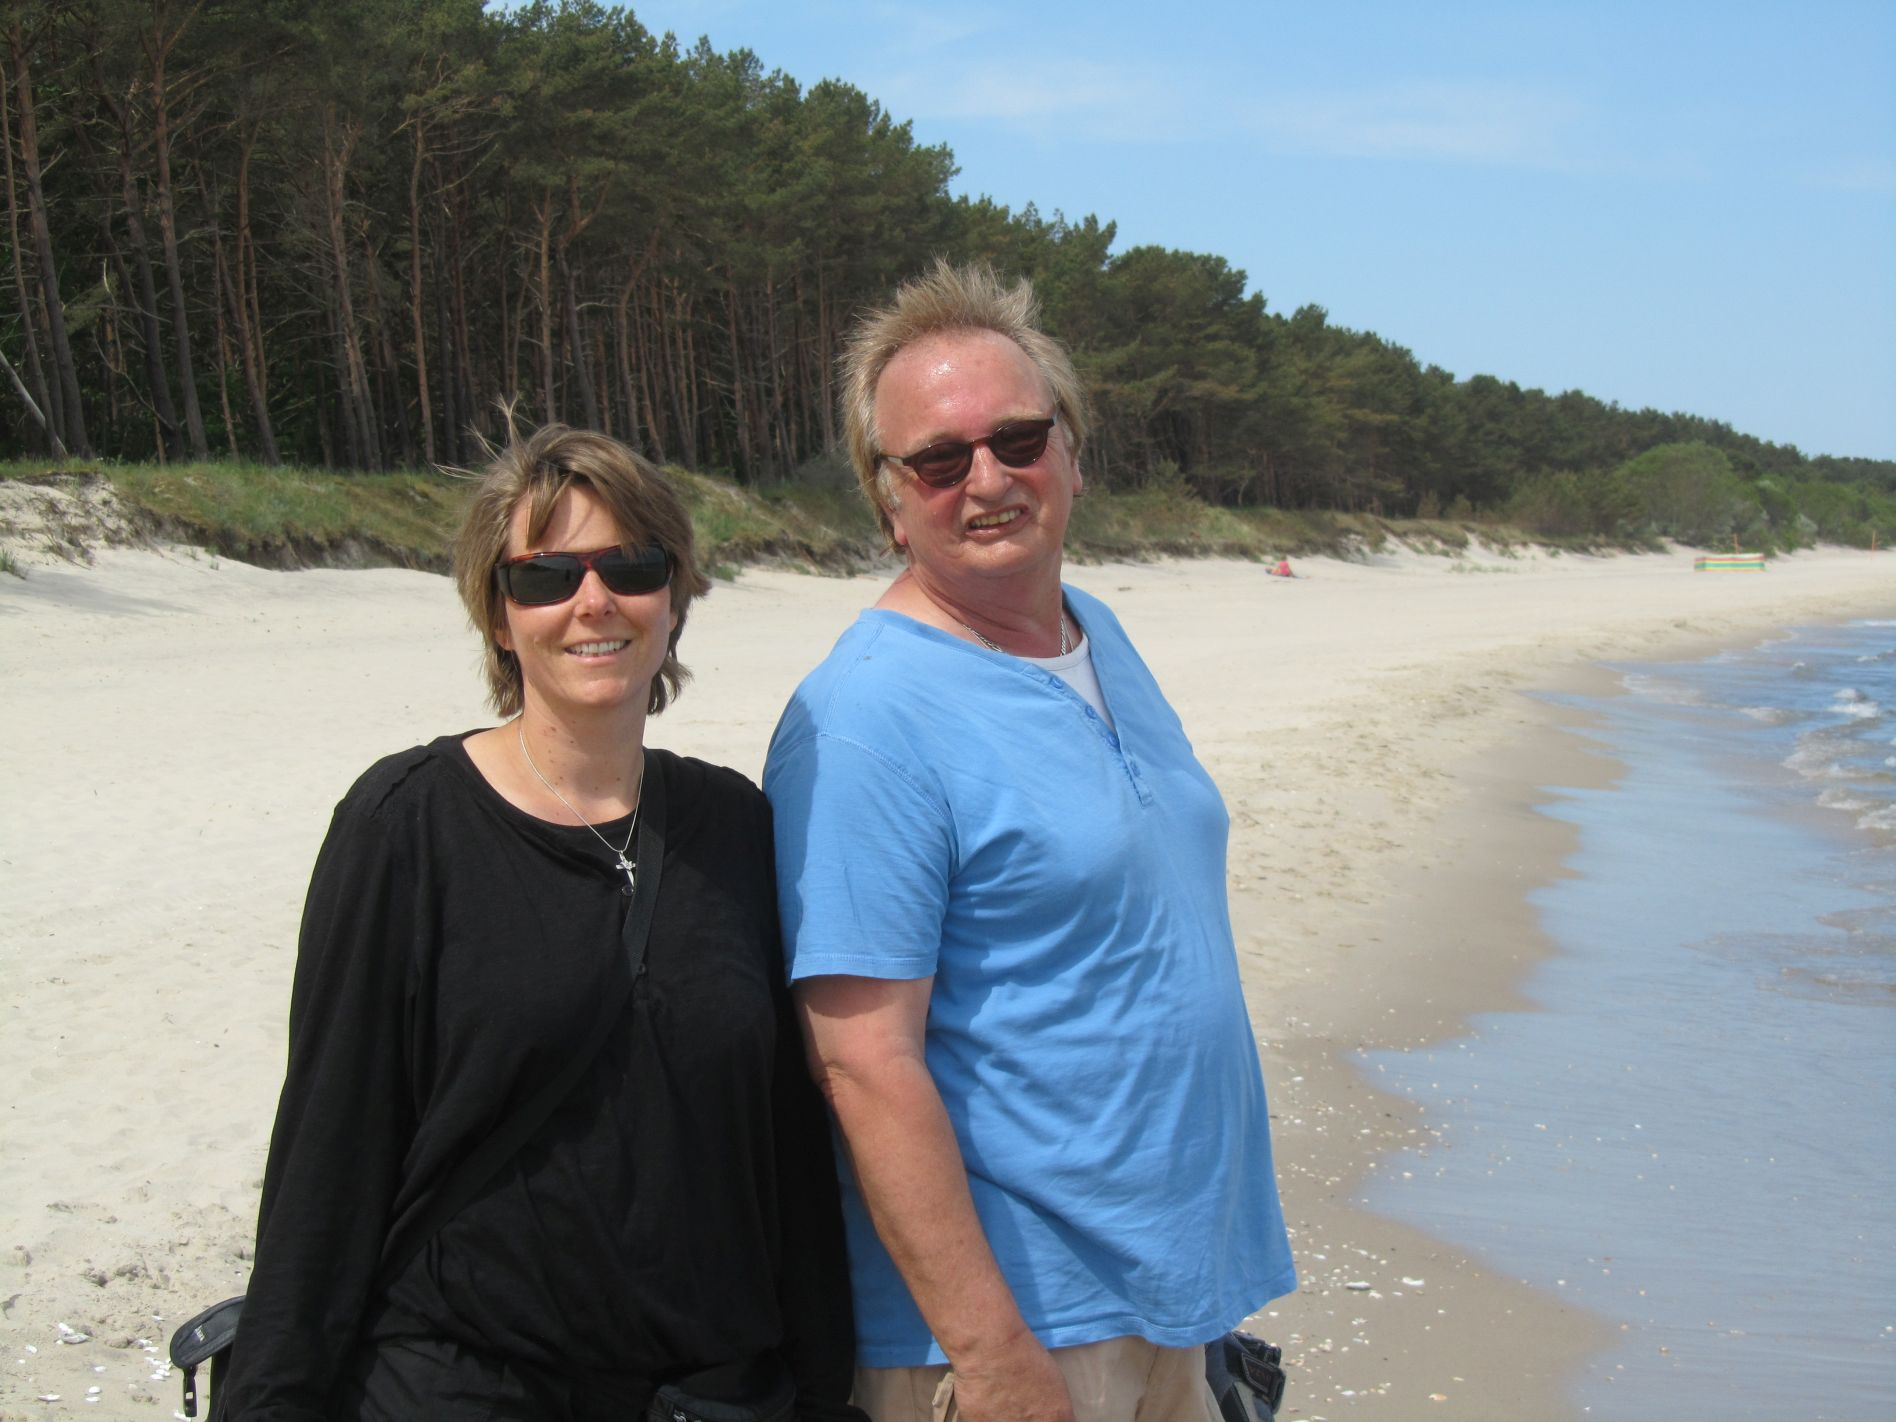 Dunja und Stephan am Strand auf Usedom